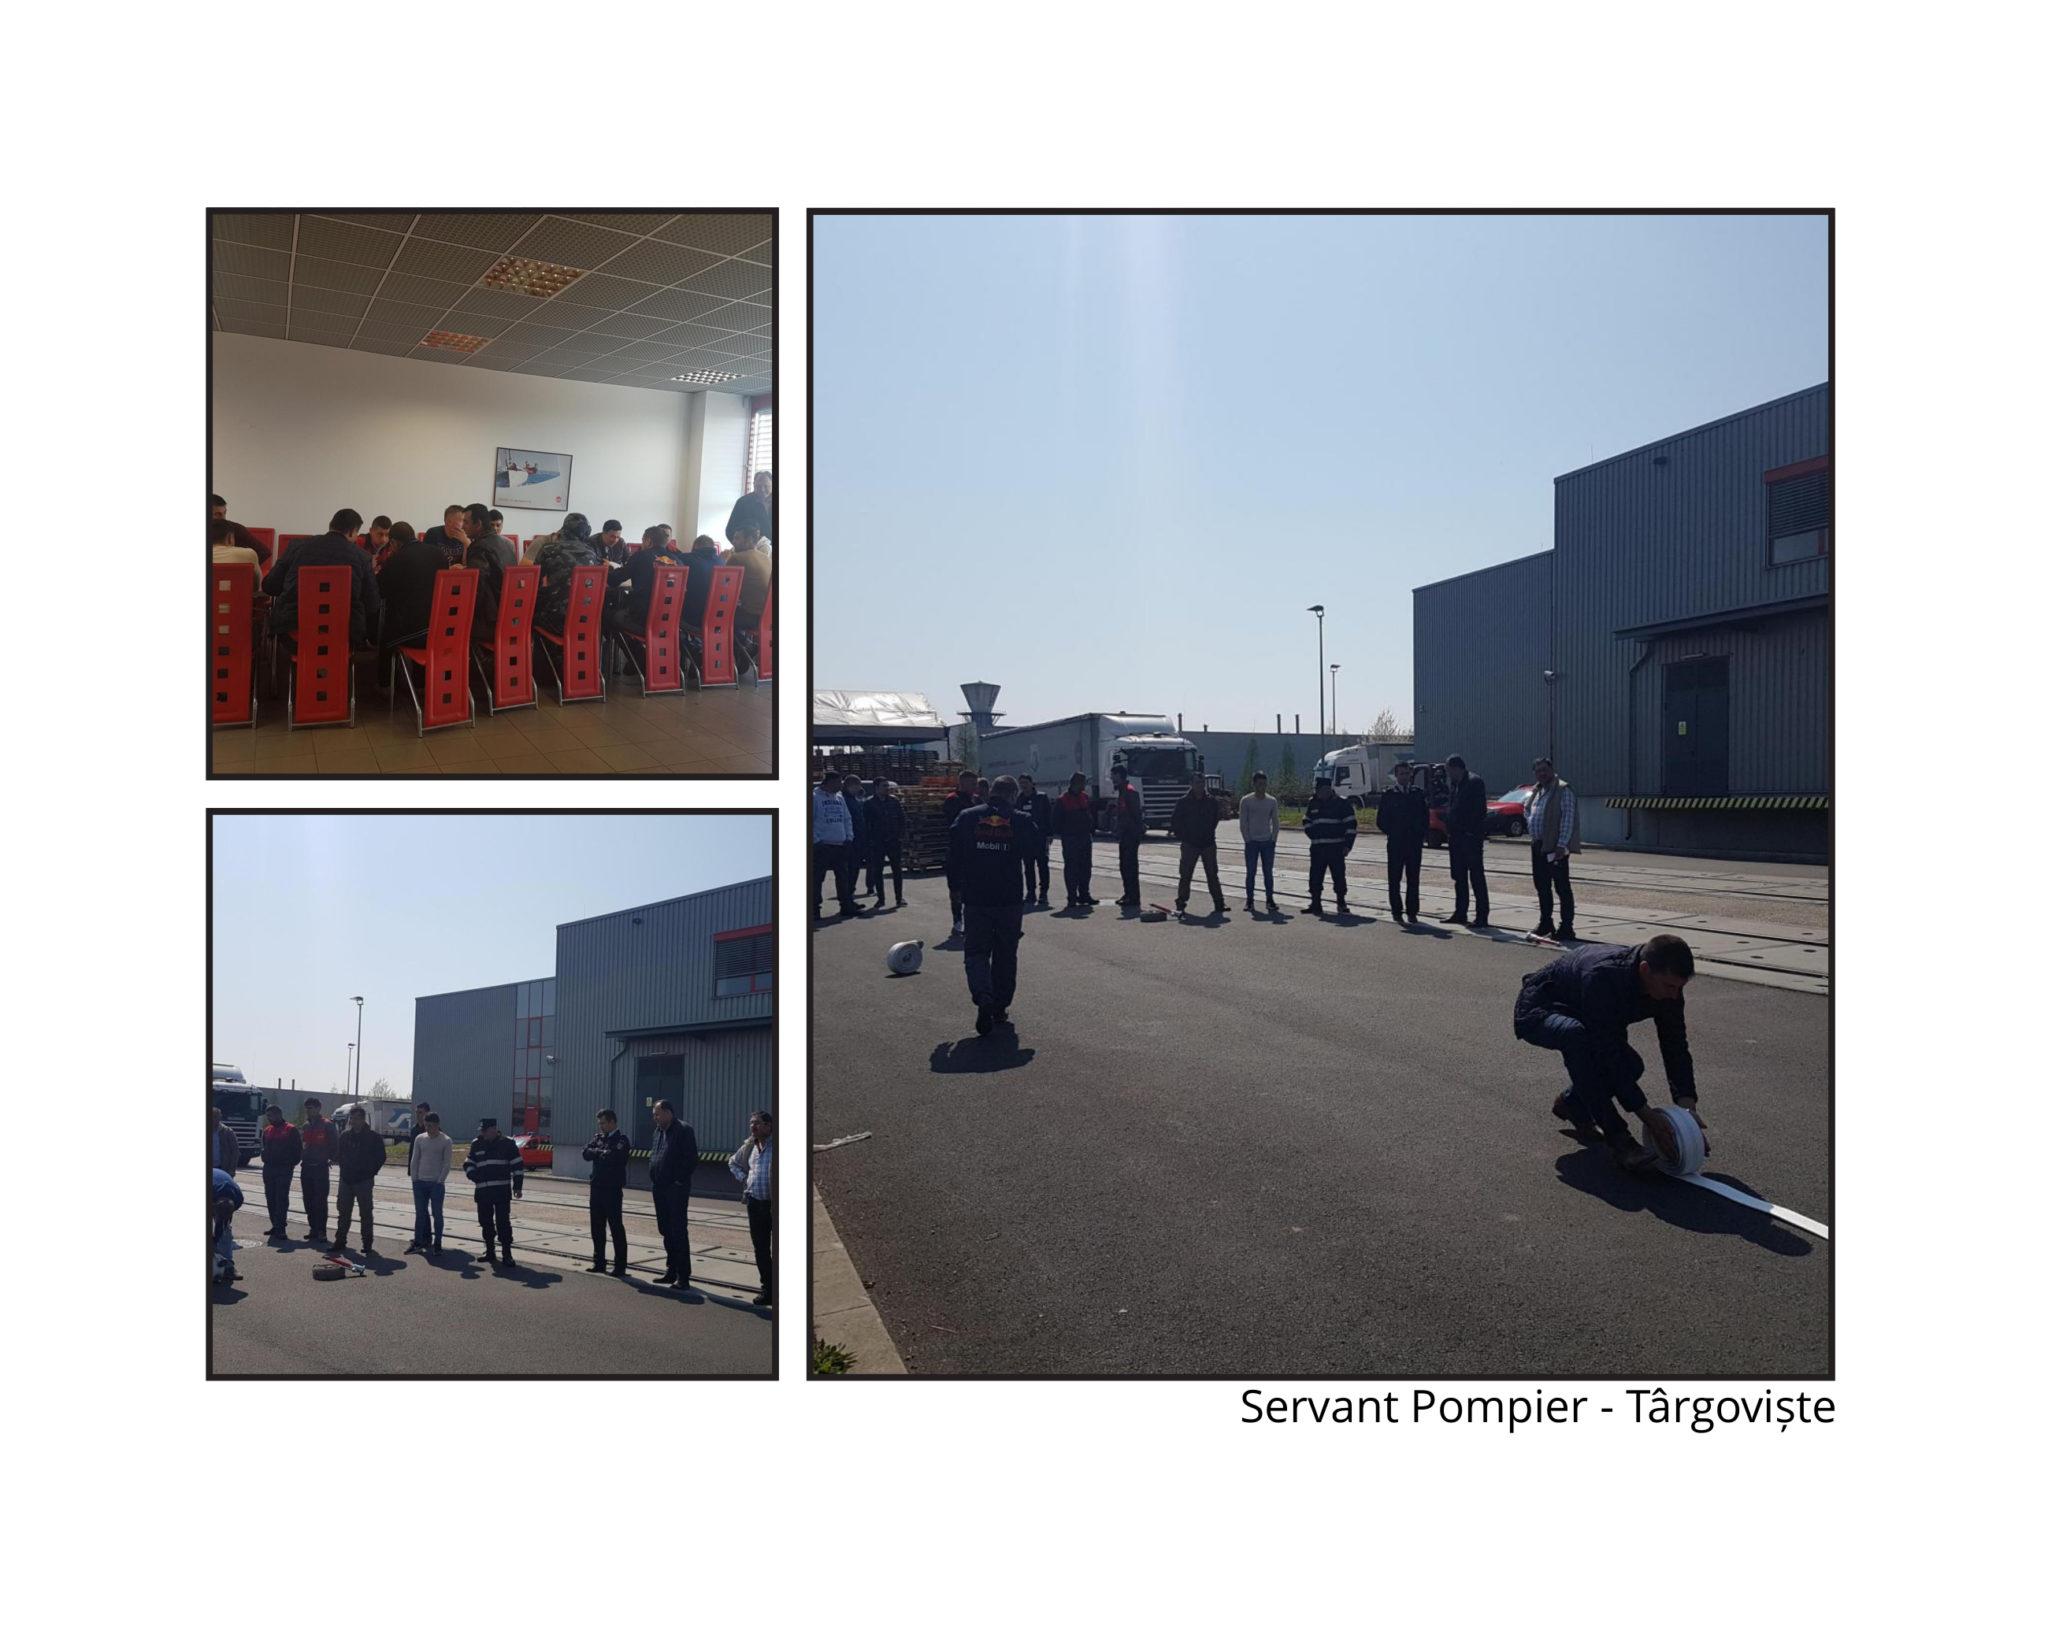 Servant pompier – Târgoviște, jud. Dâmbovița